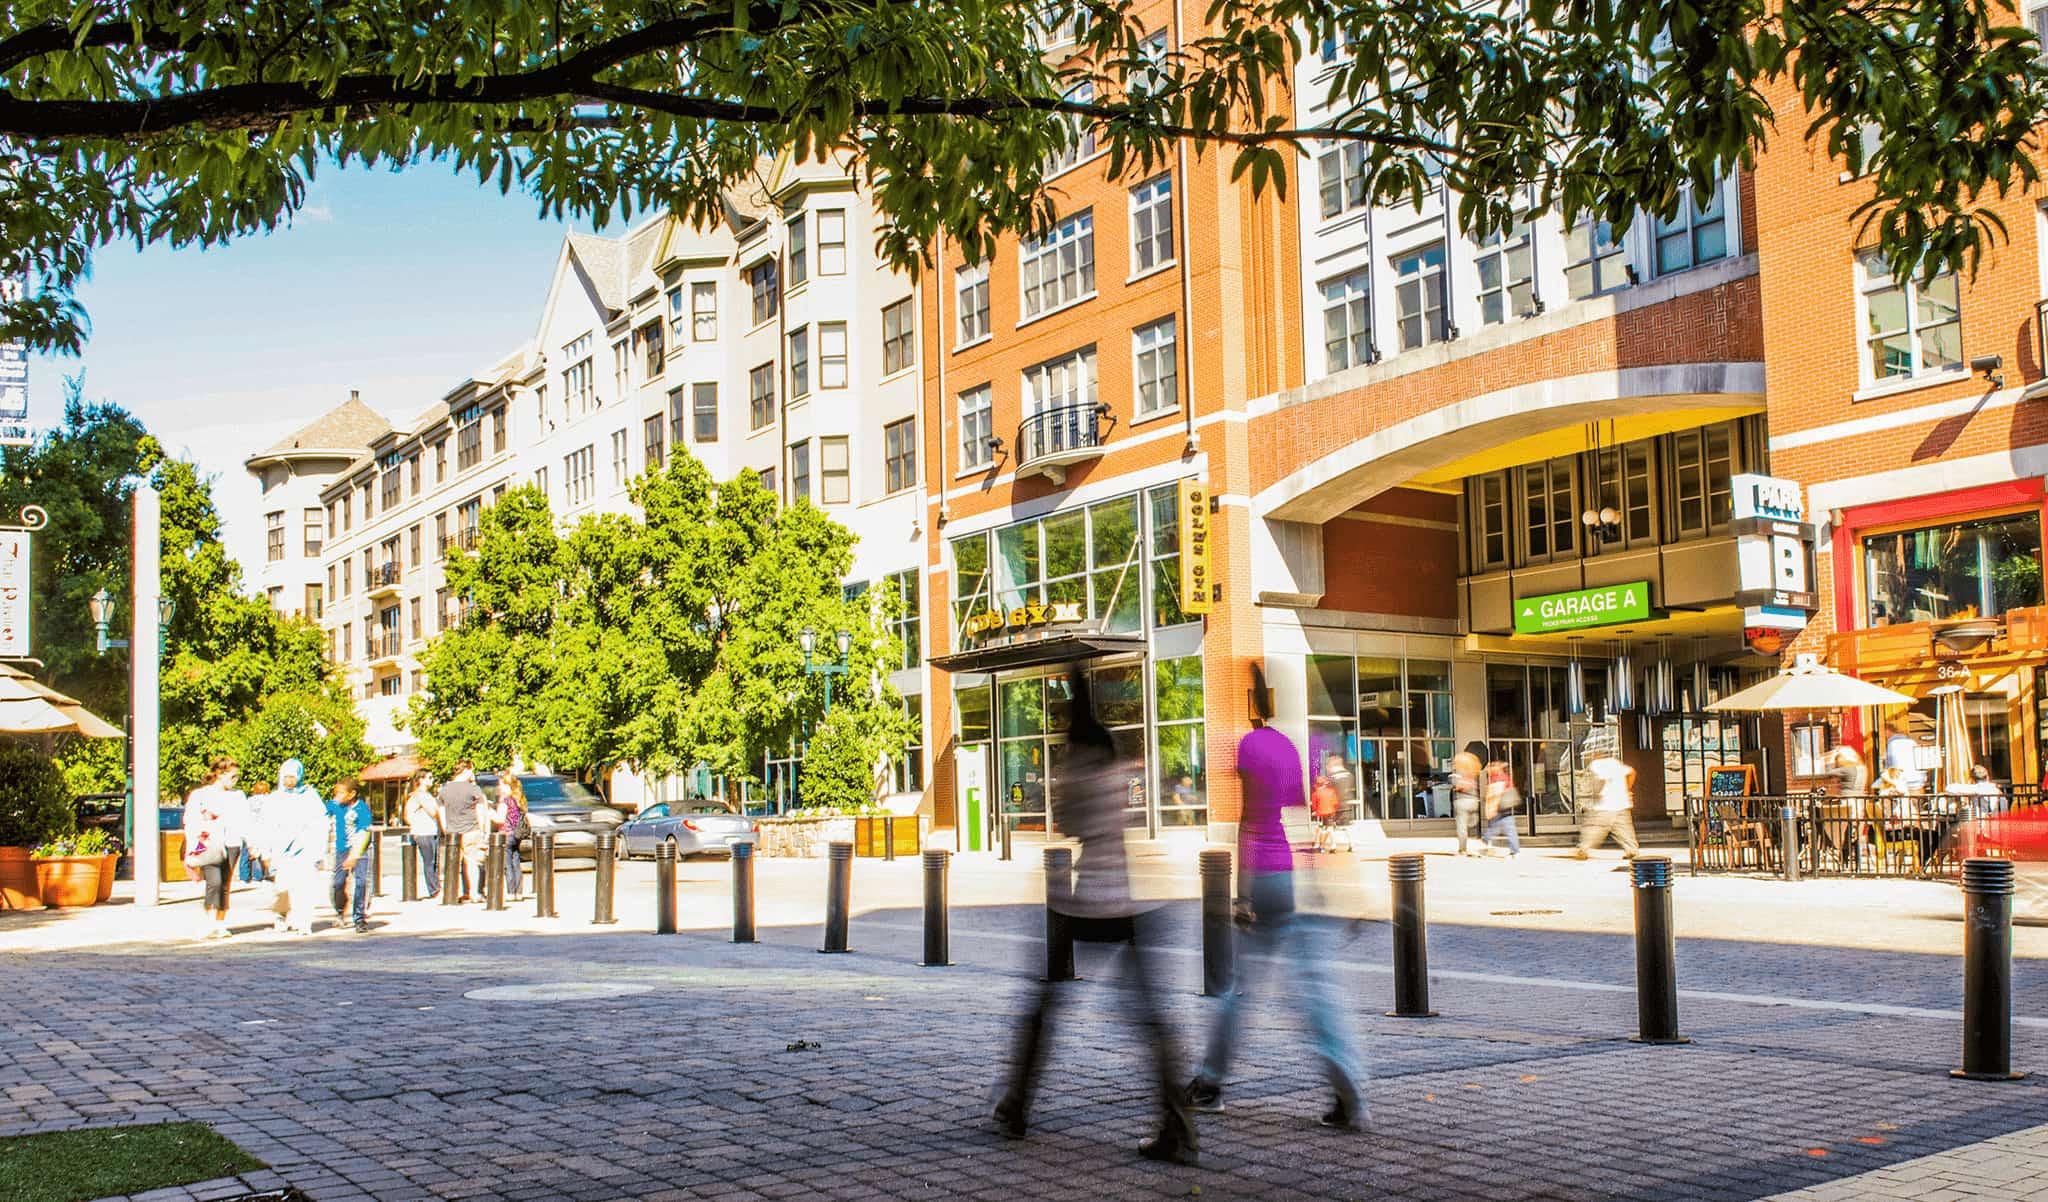 Shopping in Rockville, MD